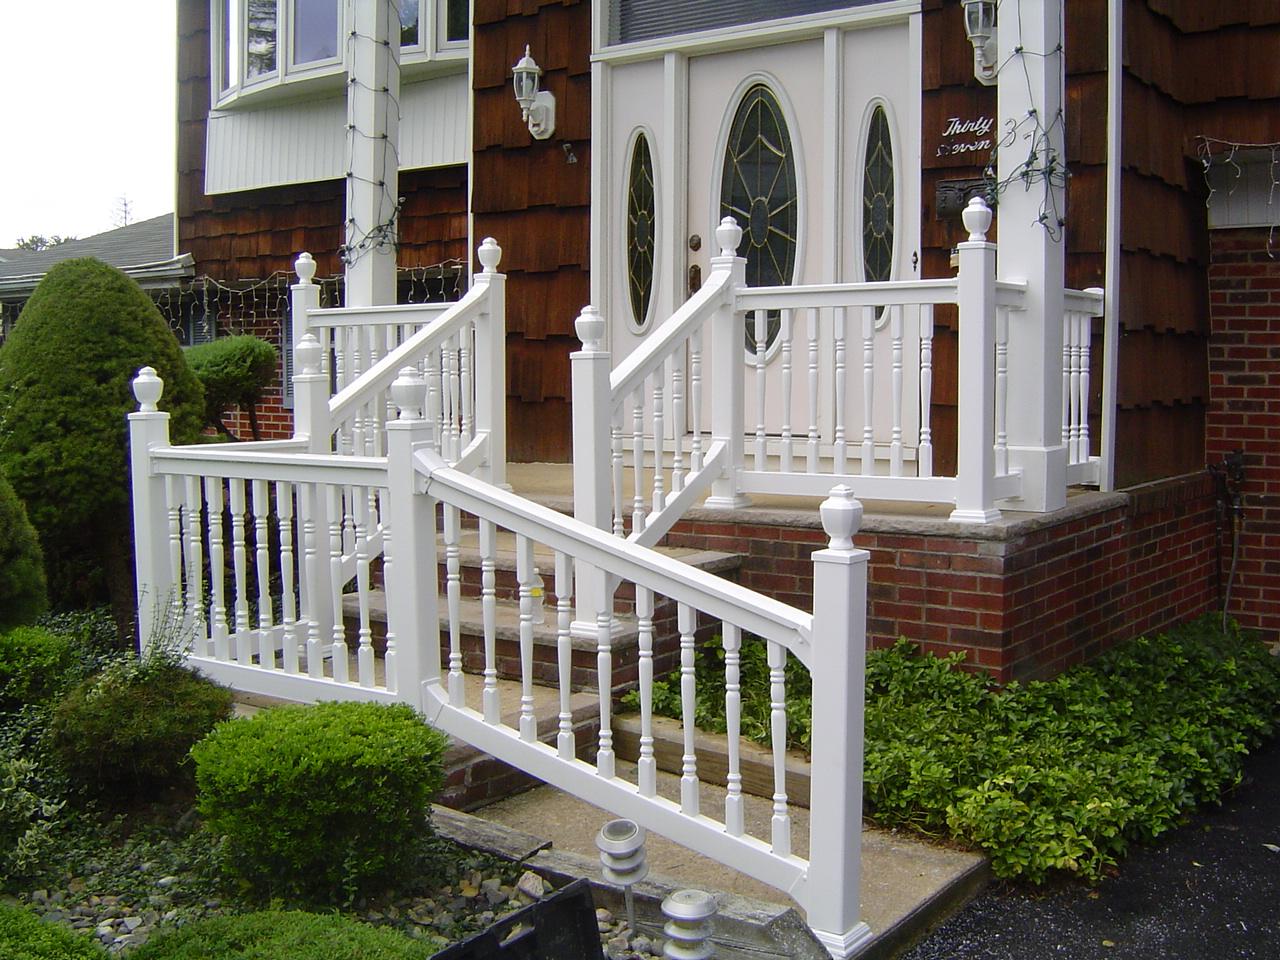 pvc railings quality fence company. Black Bedroom Furniture Sets. Home Design Ideas